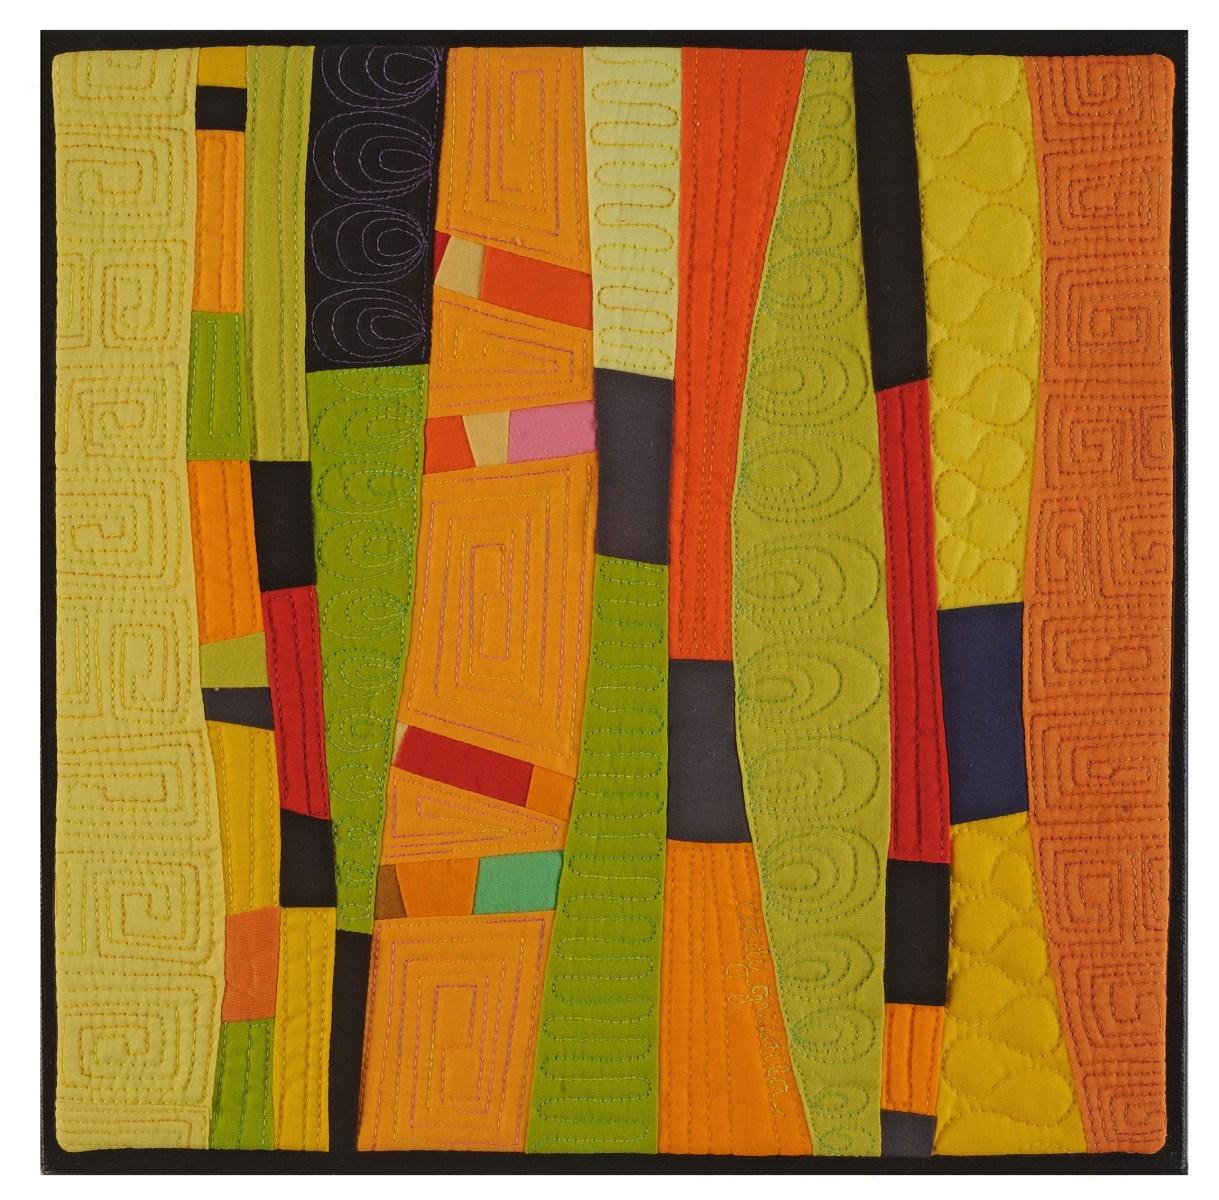 Metamorphosis art quilt in orange yellow and green - Cindy Grisdela